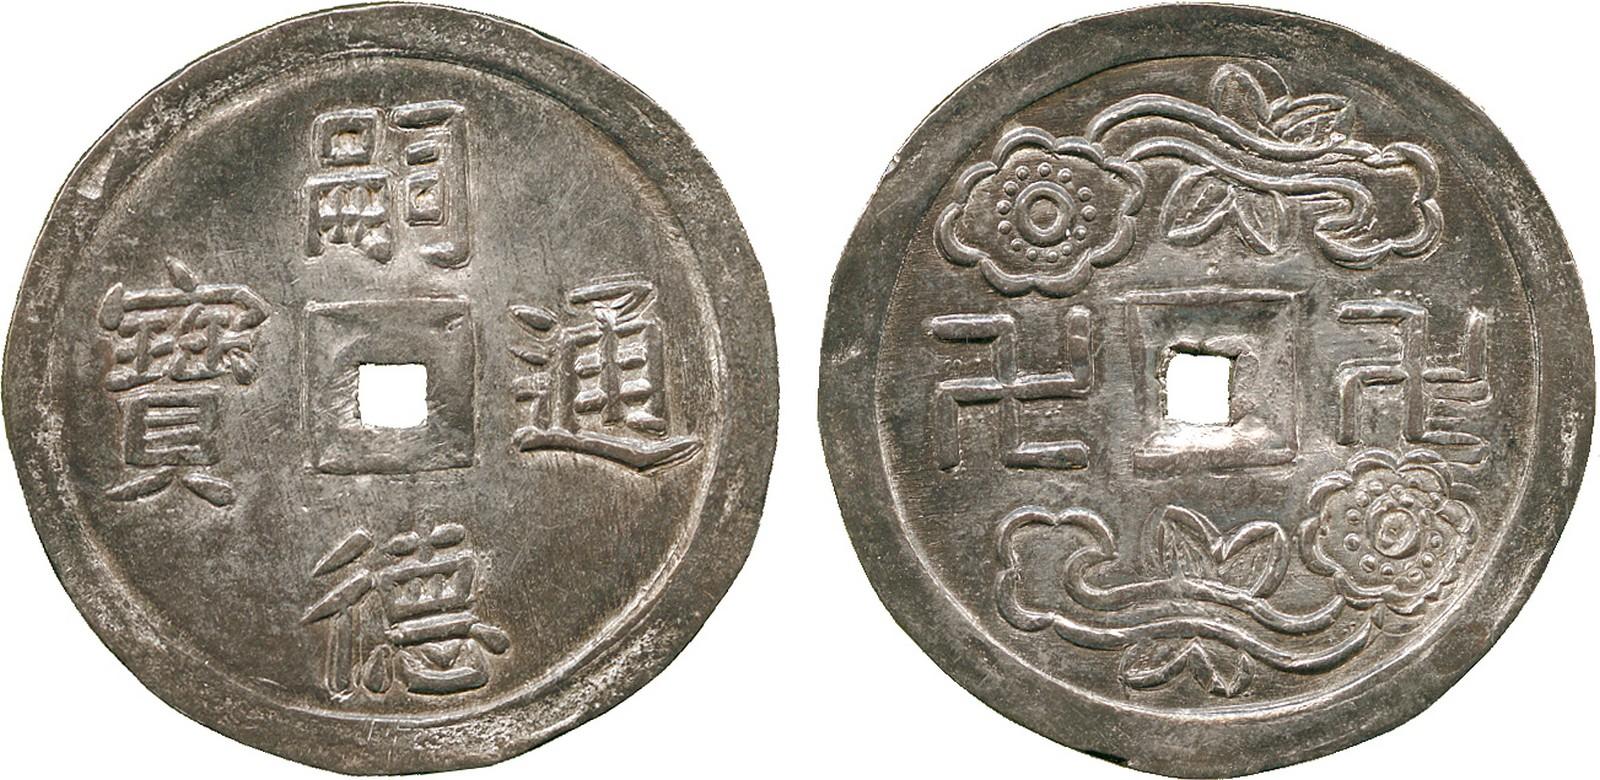 "Lot 797 - COINS, 錢幣, VIETNAM, 越南, Tu Duc 嗣德: Silver Tien, Obv Tu Duc Thong Bao ""嗣德通寶"" around square central"